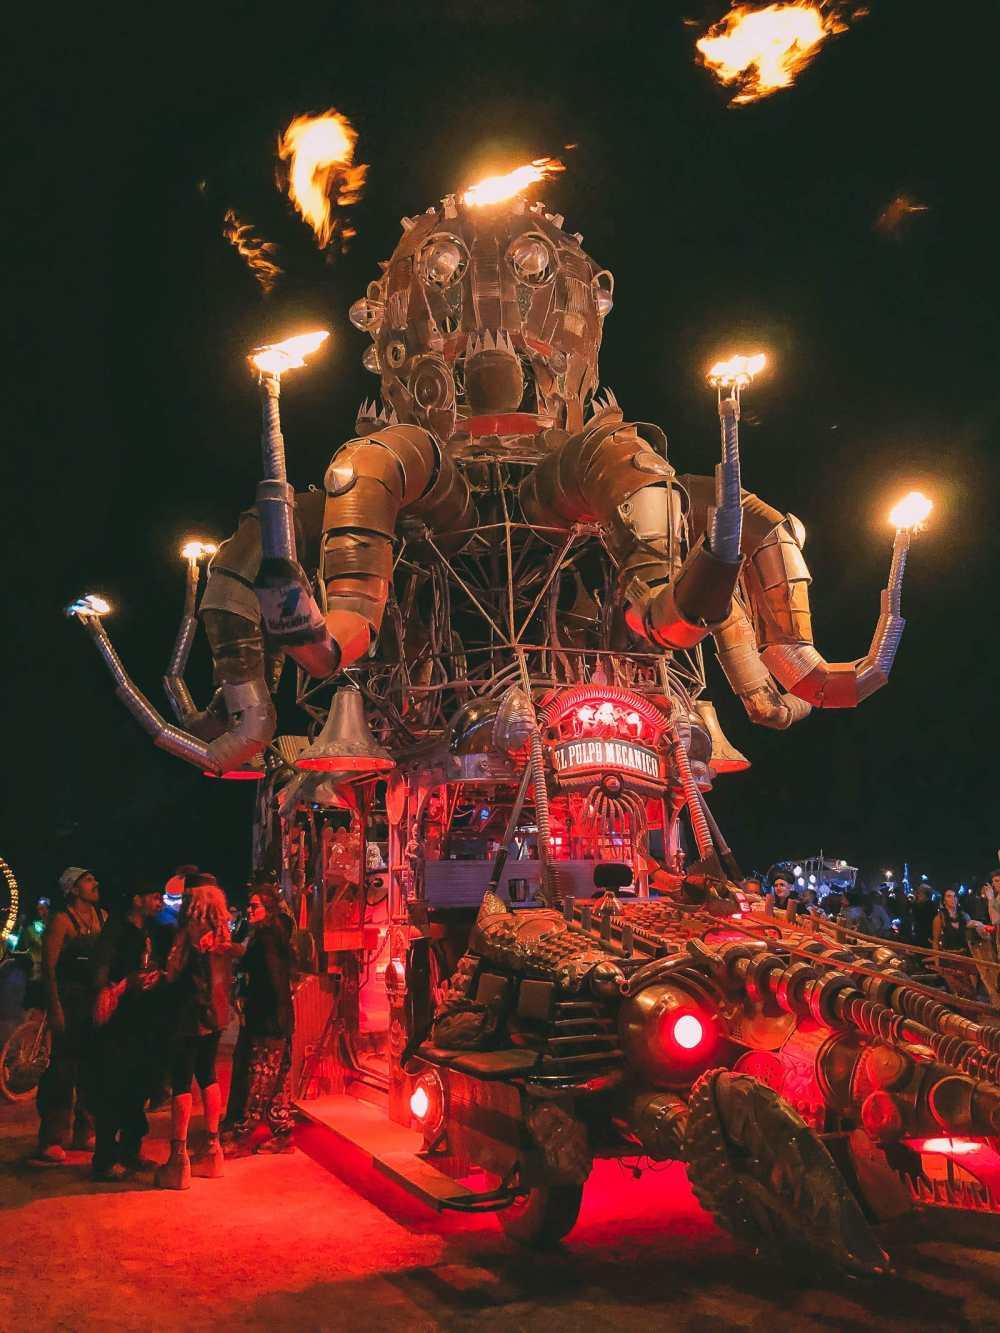 Руководство для новичков по Burning Man (33)